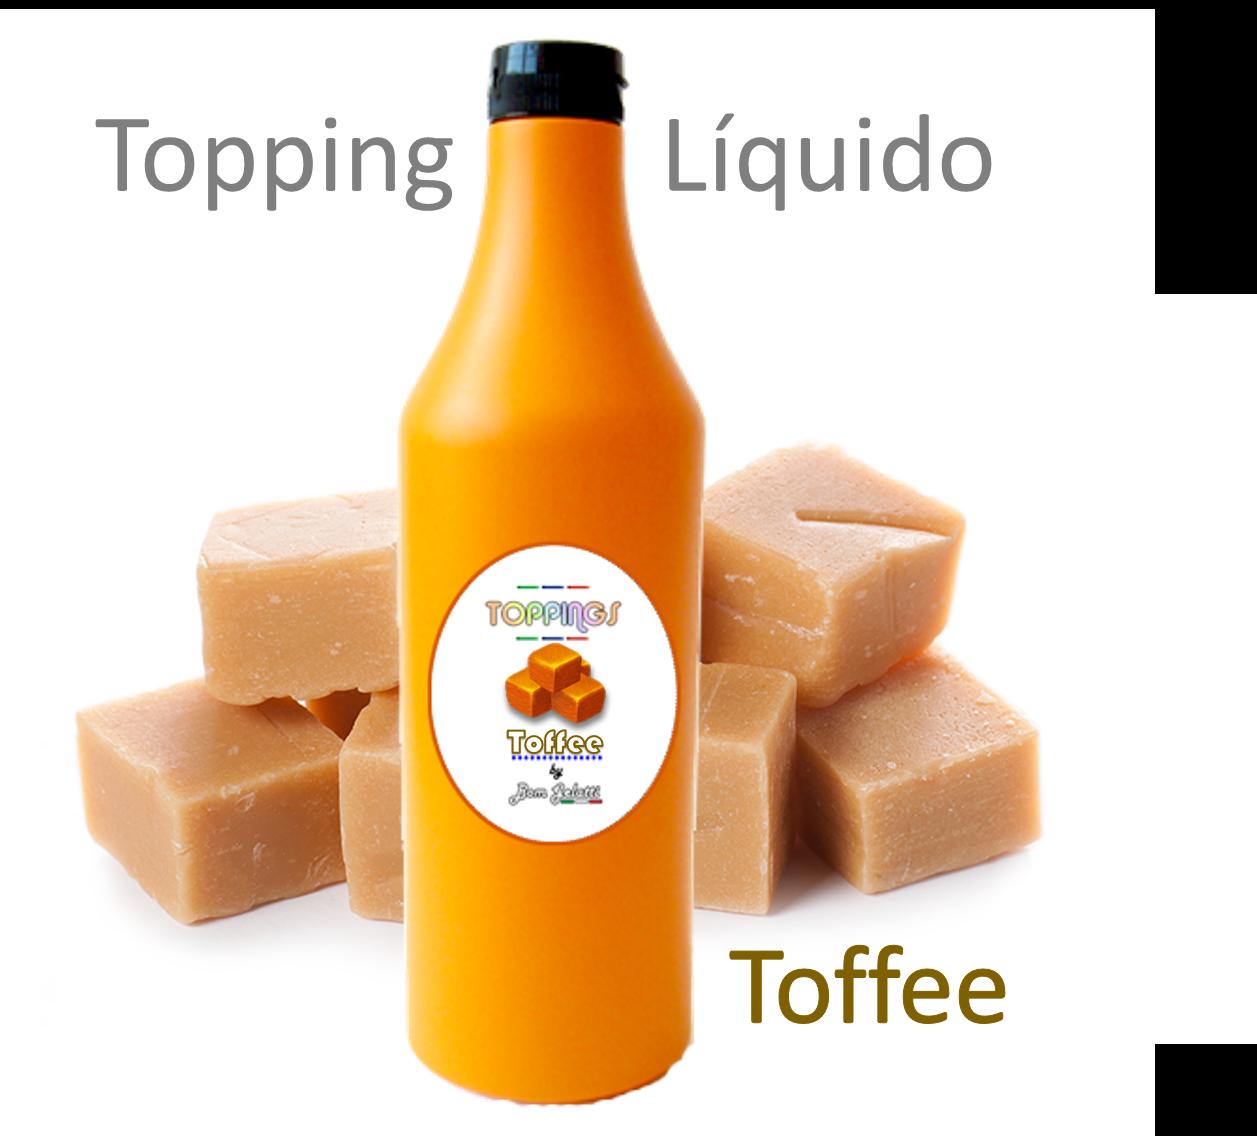 Comprar Topping Liquido De Toffee